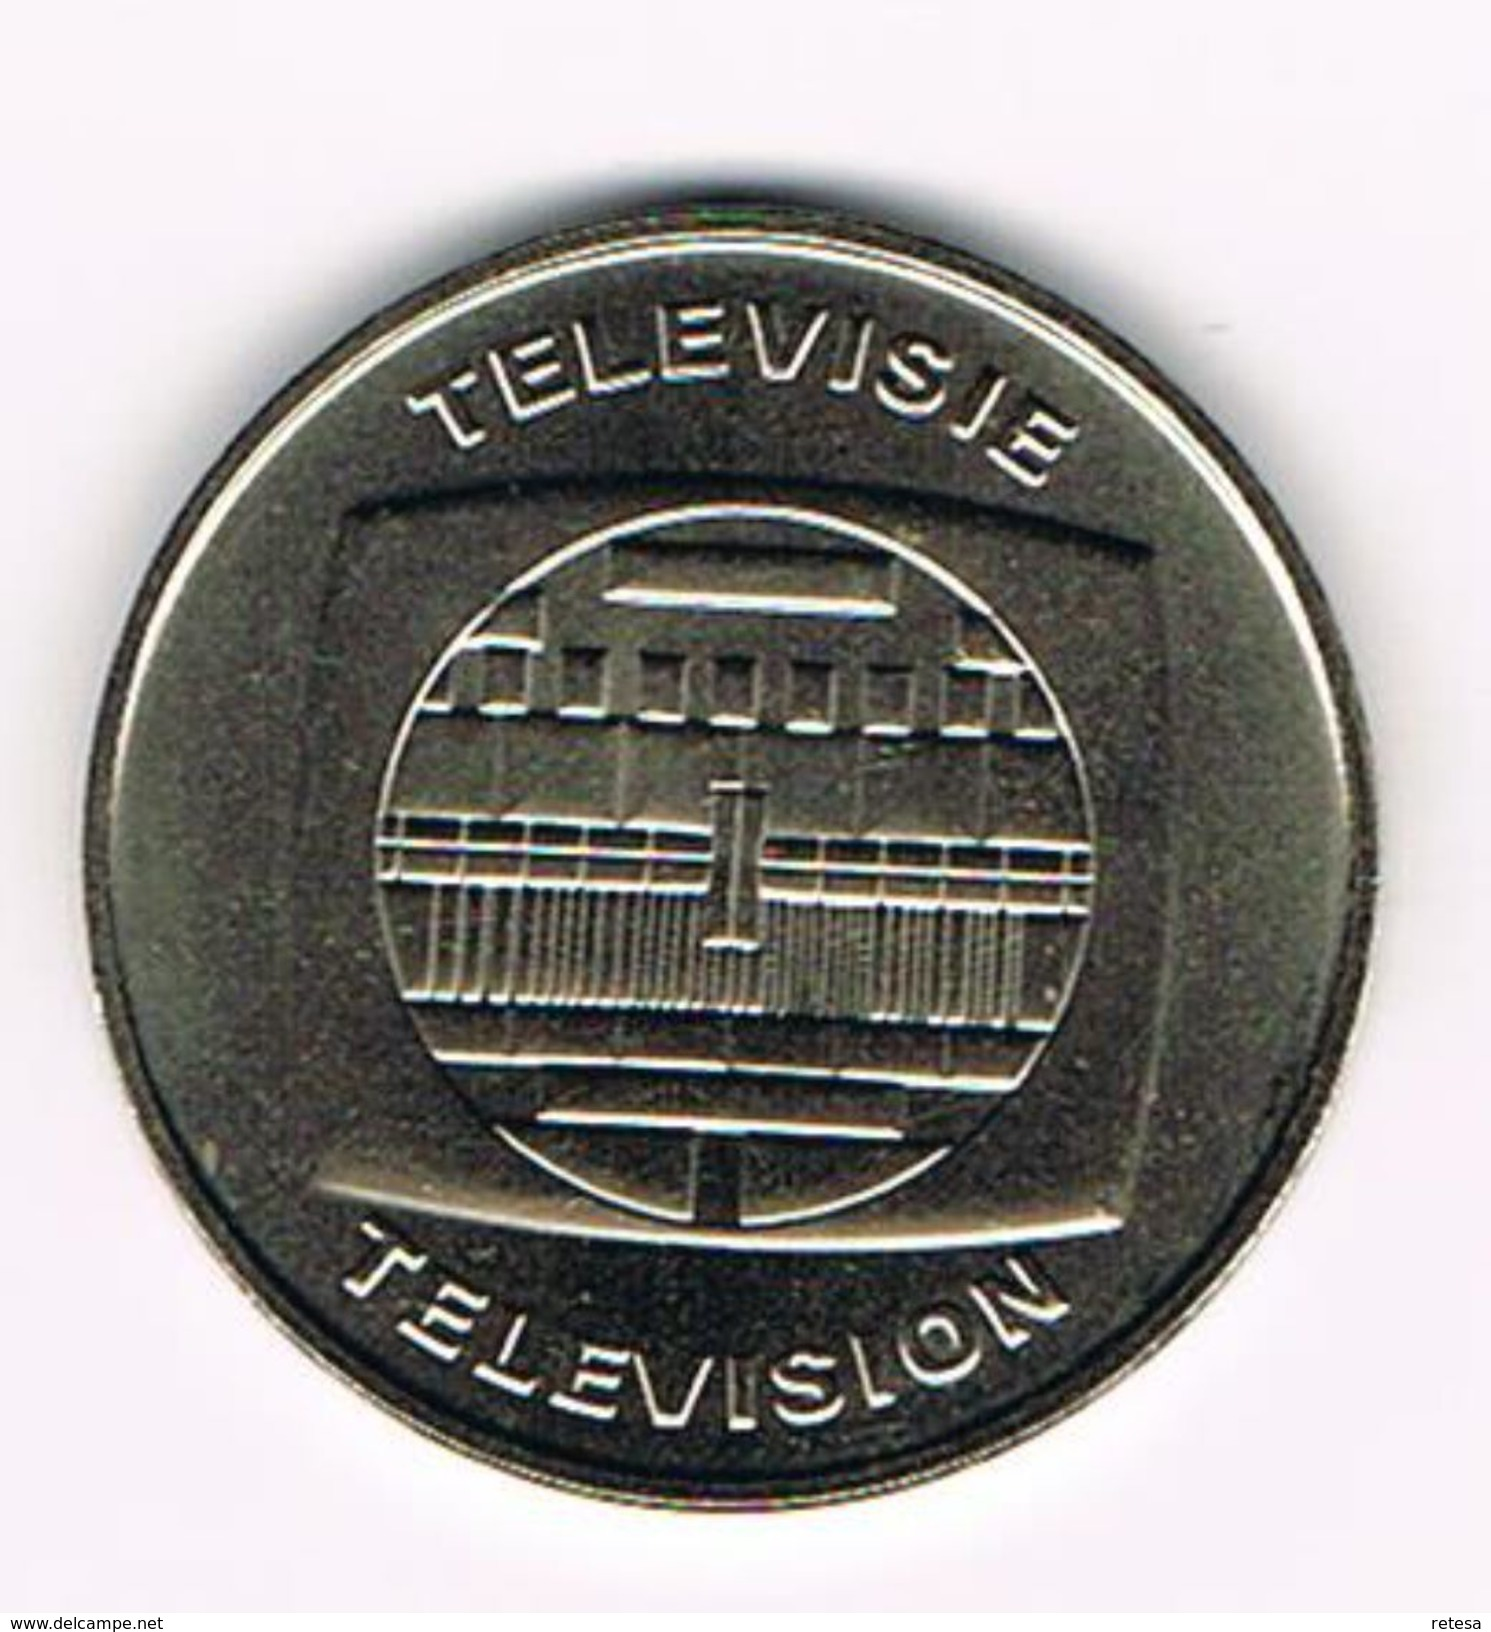 ) PENNING  50 JAAR TELEVISIE TELEVISION BELGIE - BELGIQUE  1953 - 2003 - Souvenir-Medaille (elongated Coins)